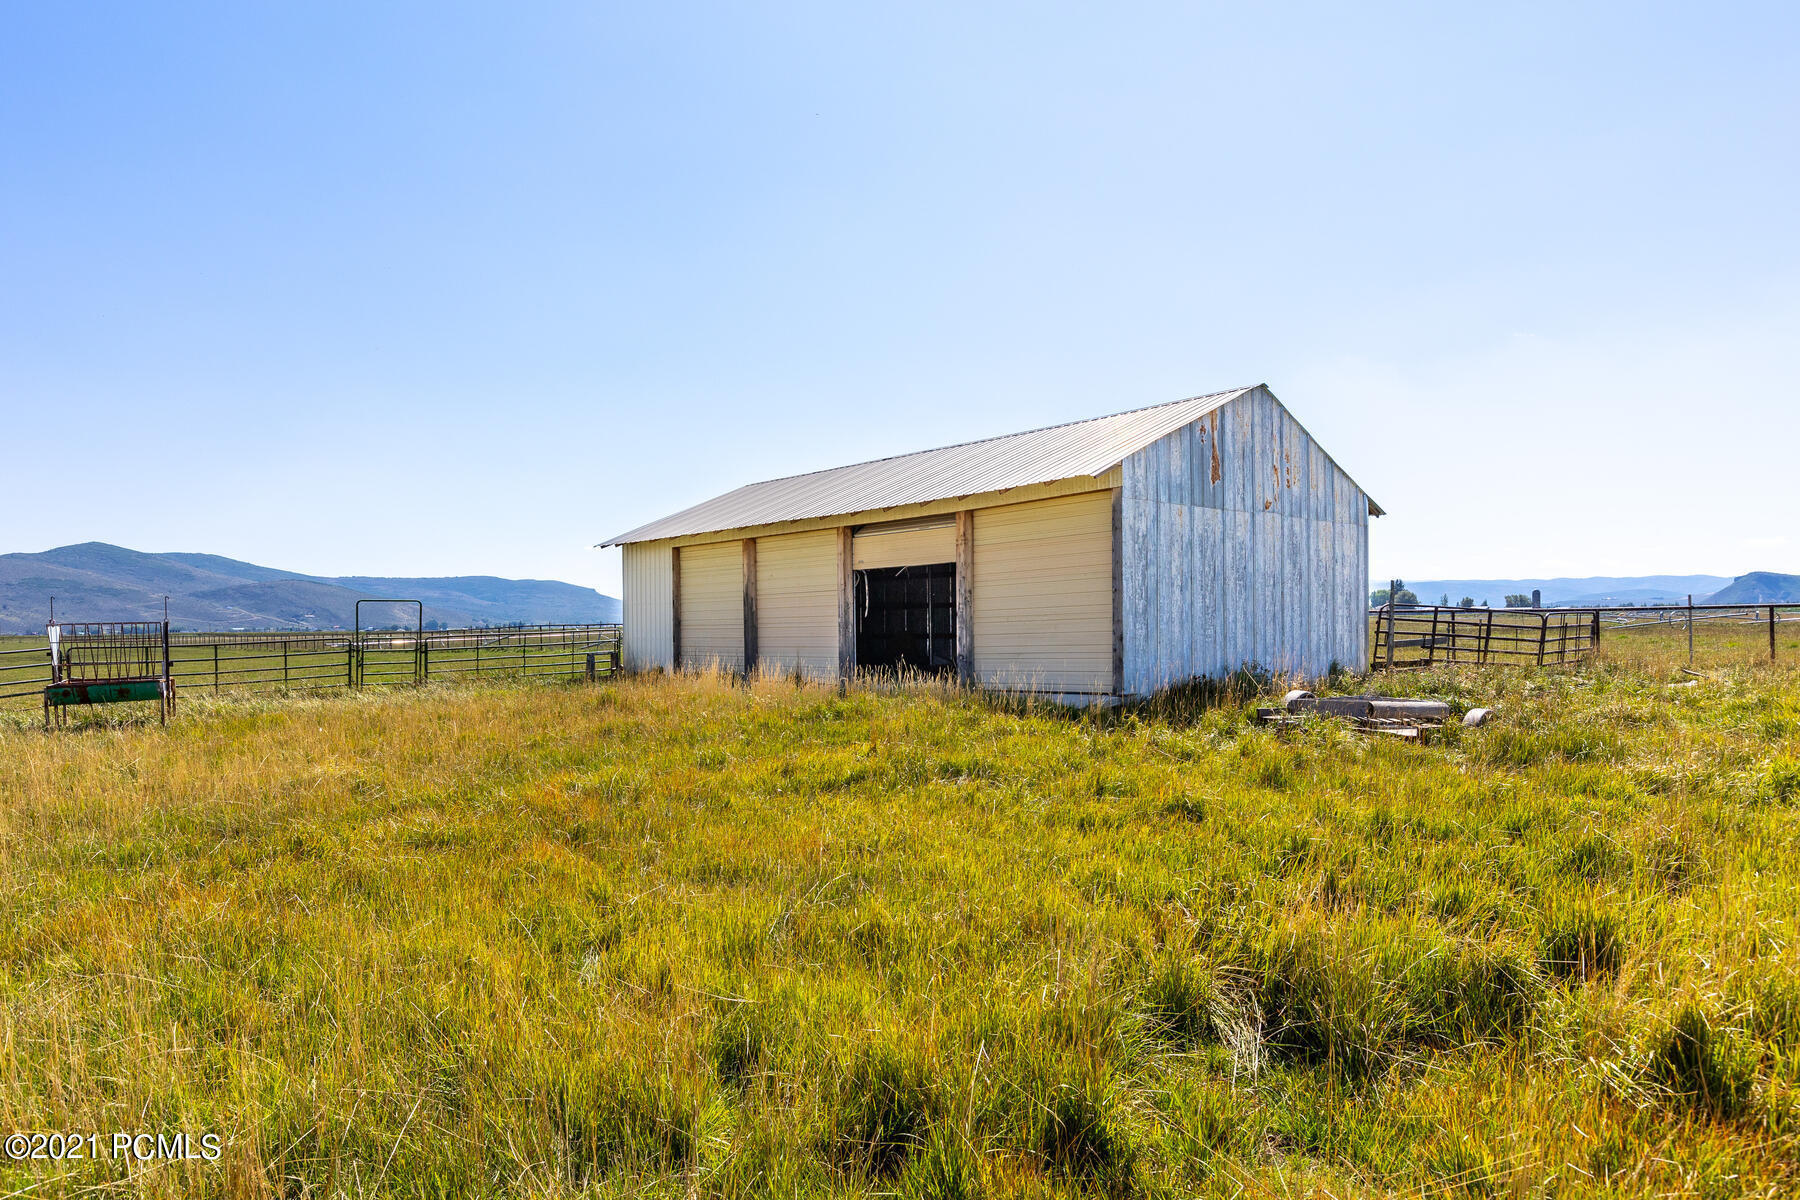 553 200 South, Kamas, Utah 84036, ,Land,For Sale,200,12103792